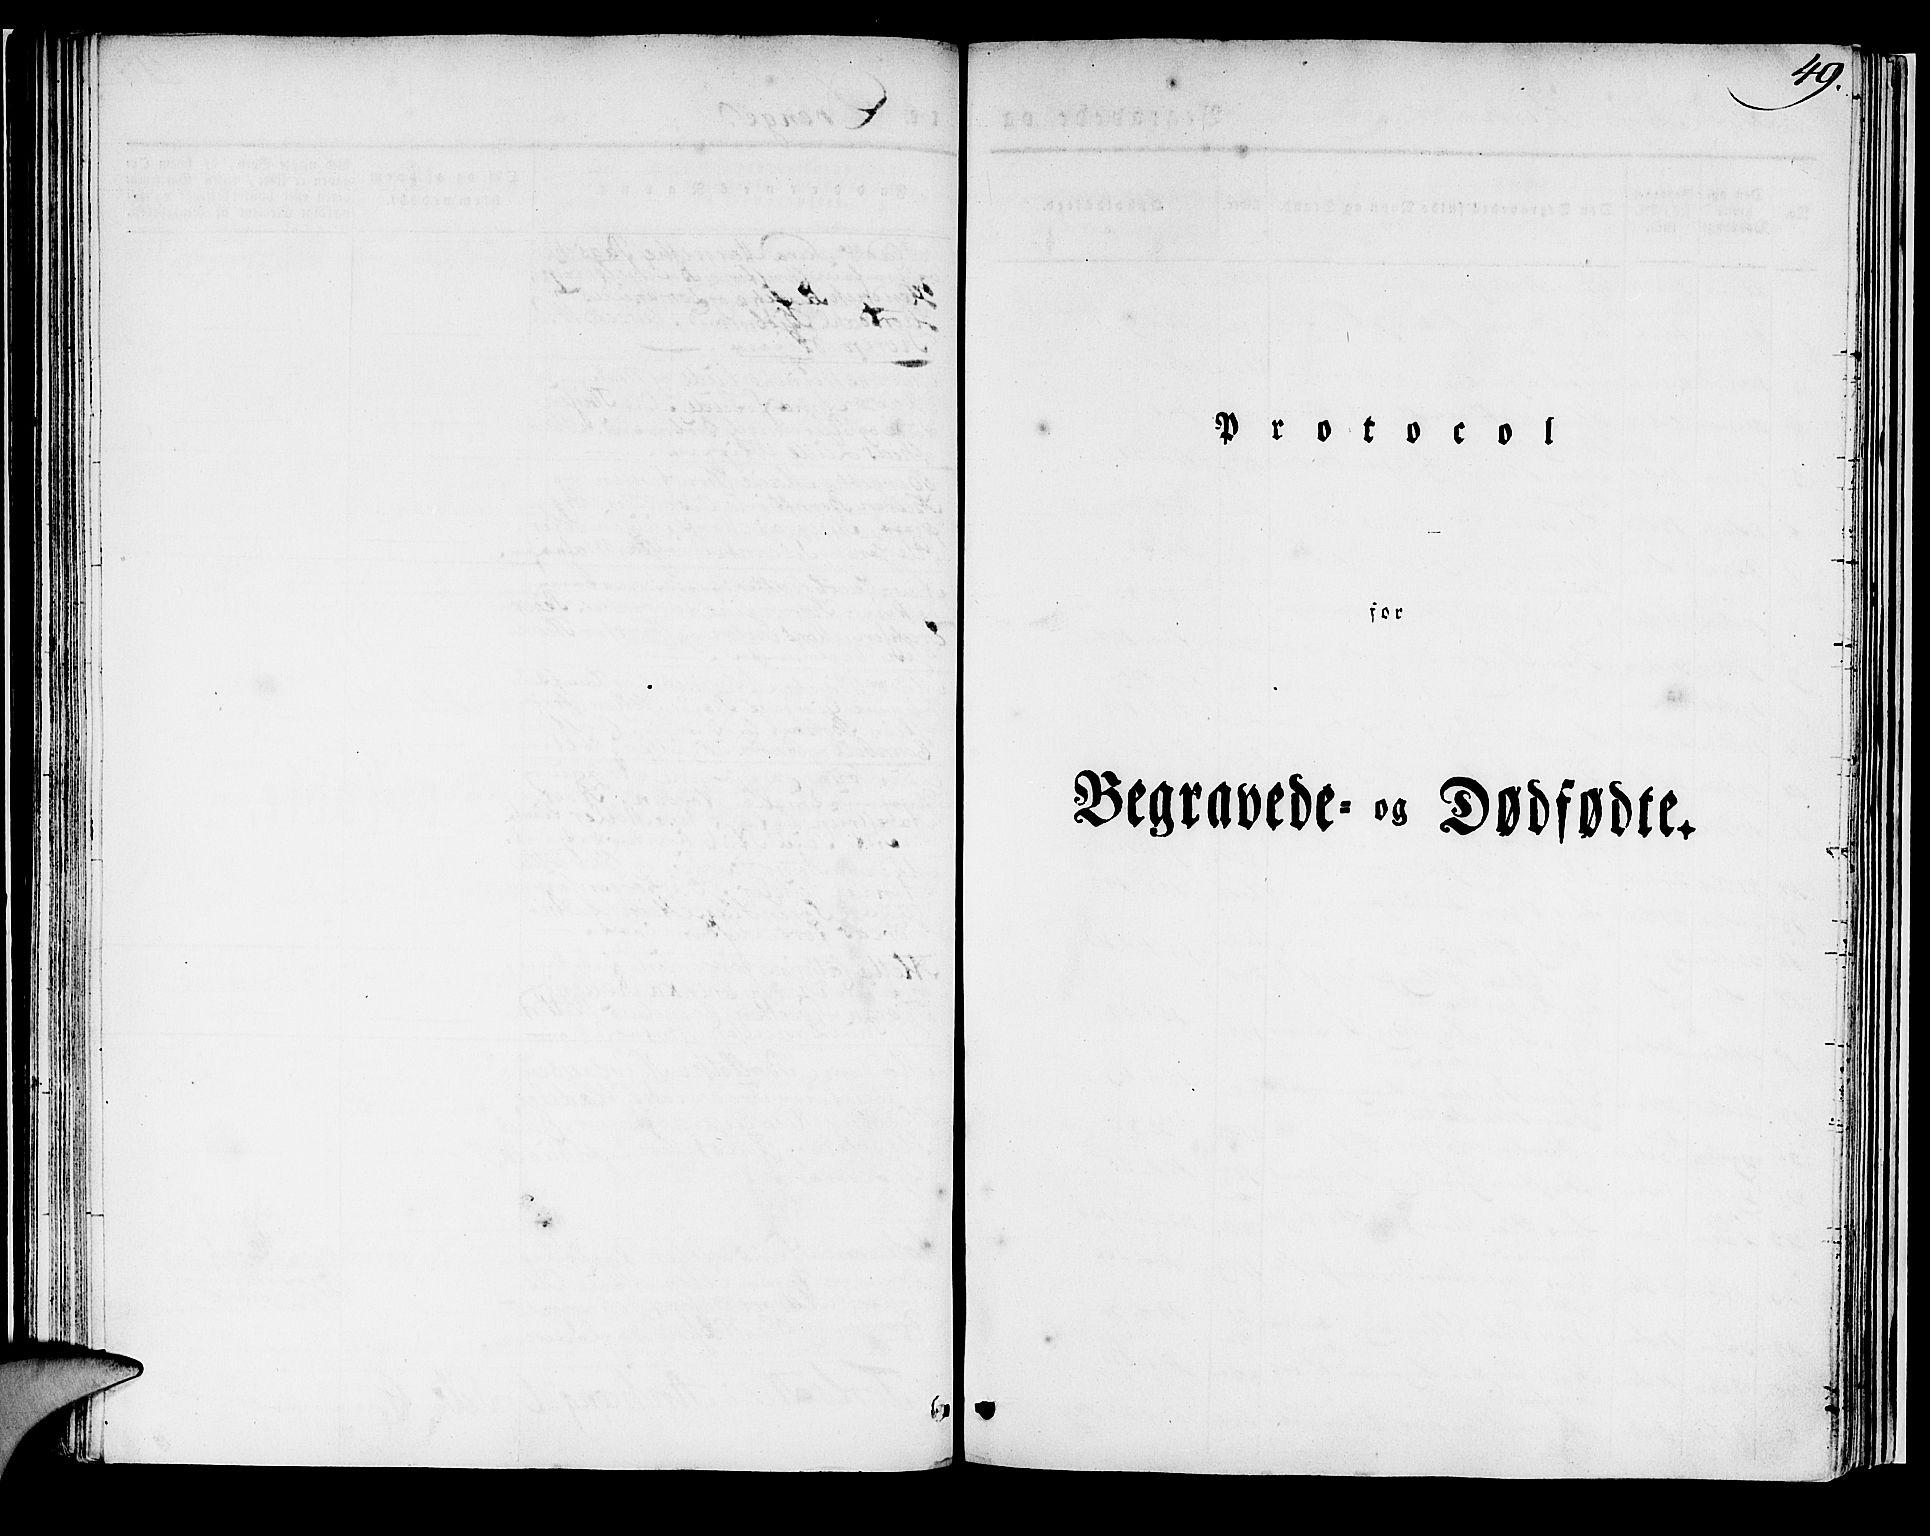 SAB, Domkirken Sokneprestembete, H/Haa/L0014: Ministerialbok nr. A 13, 1830-1837, s. 49